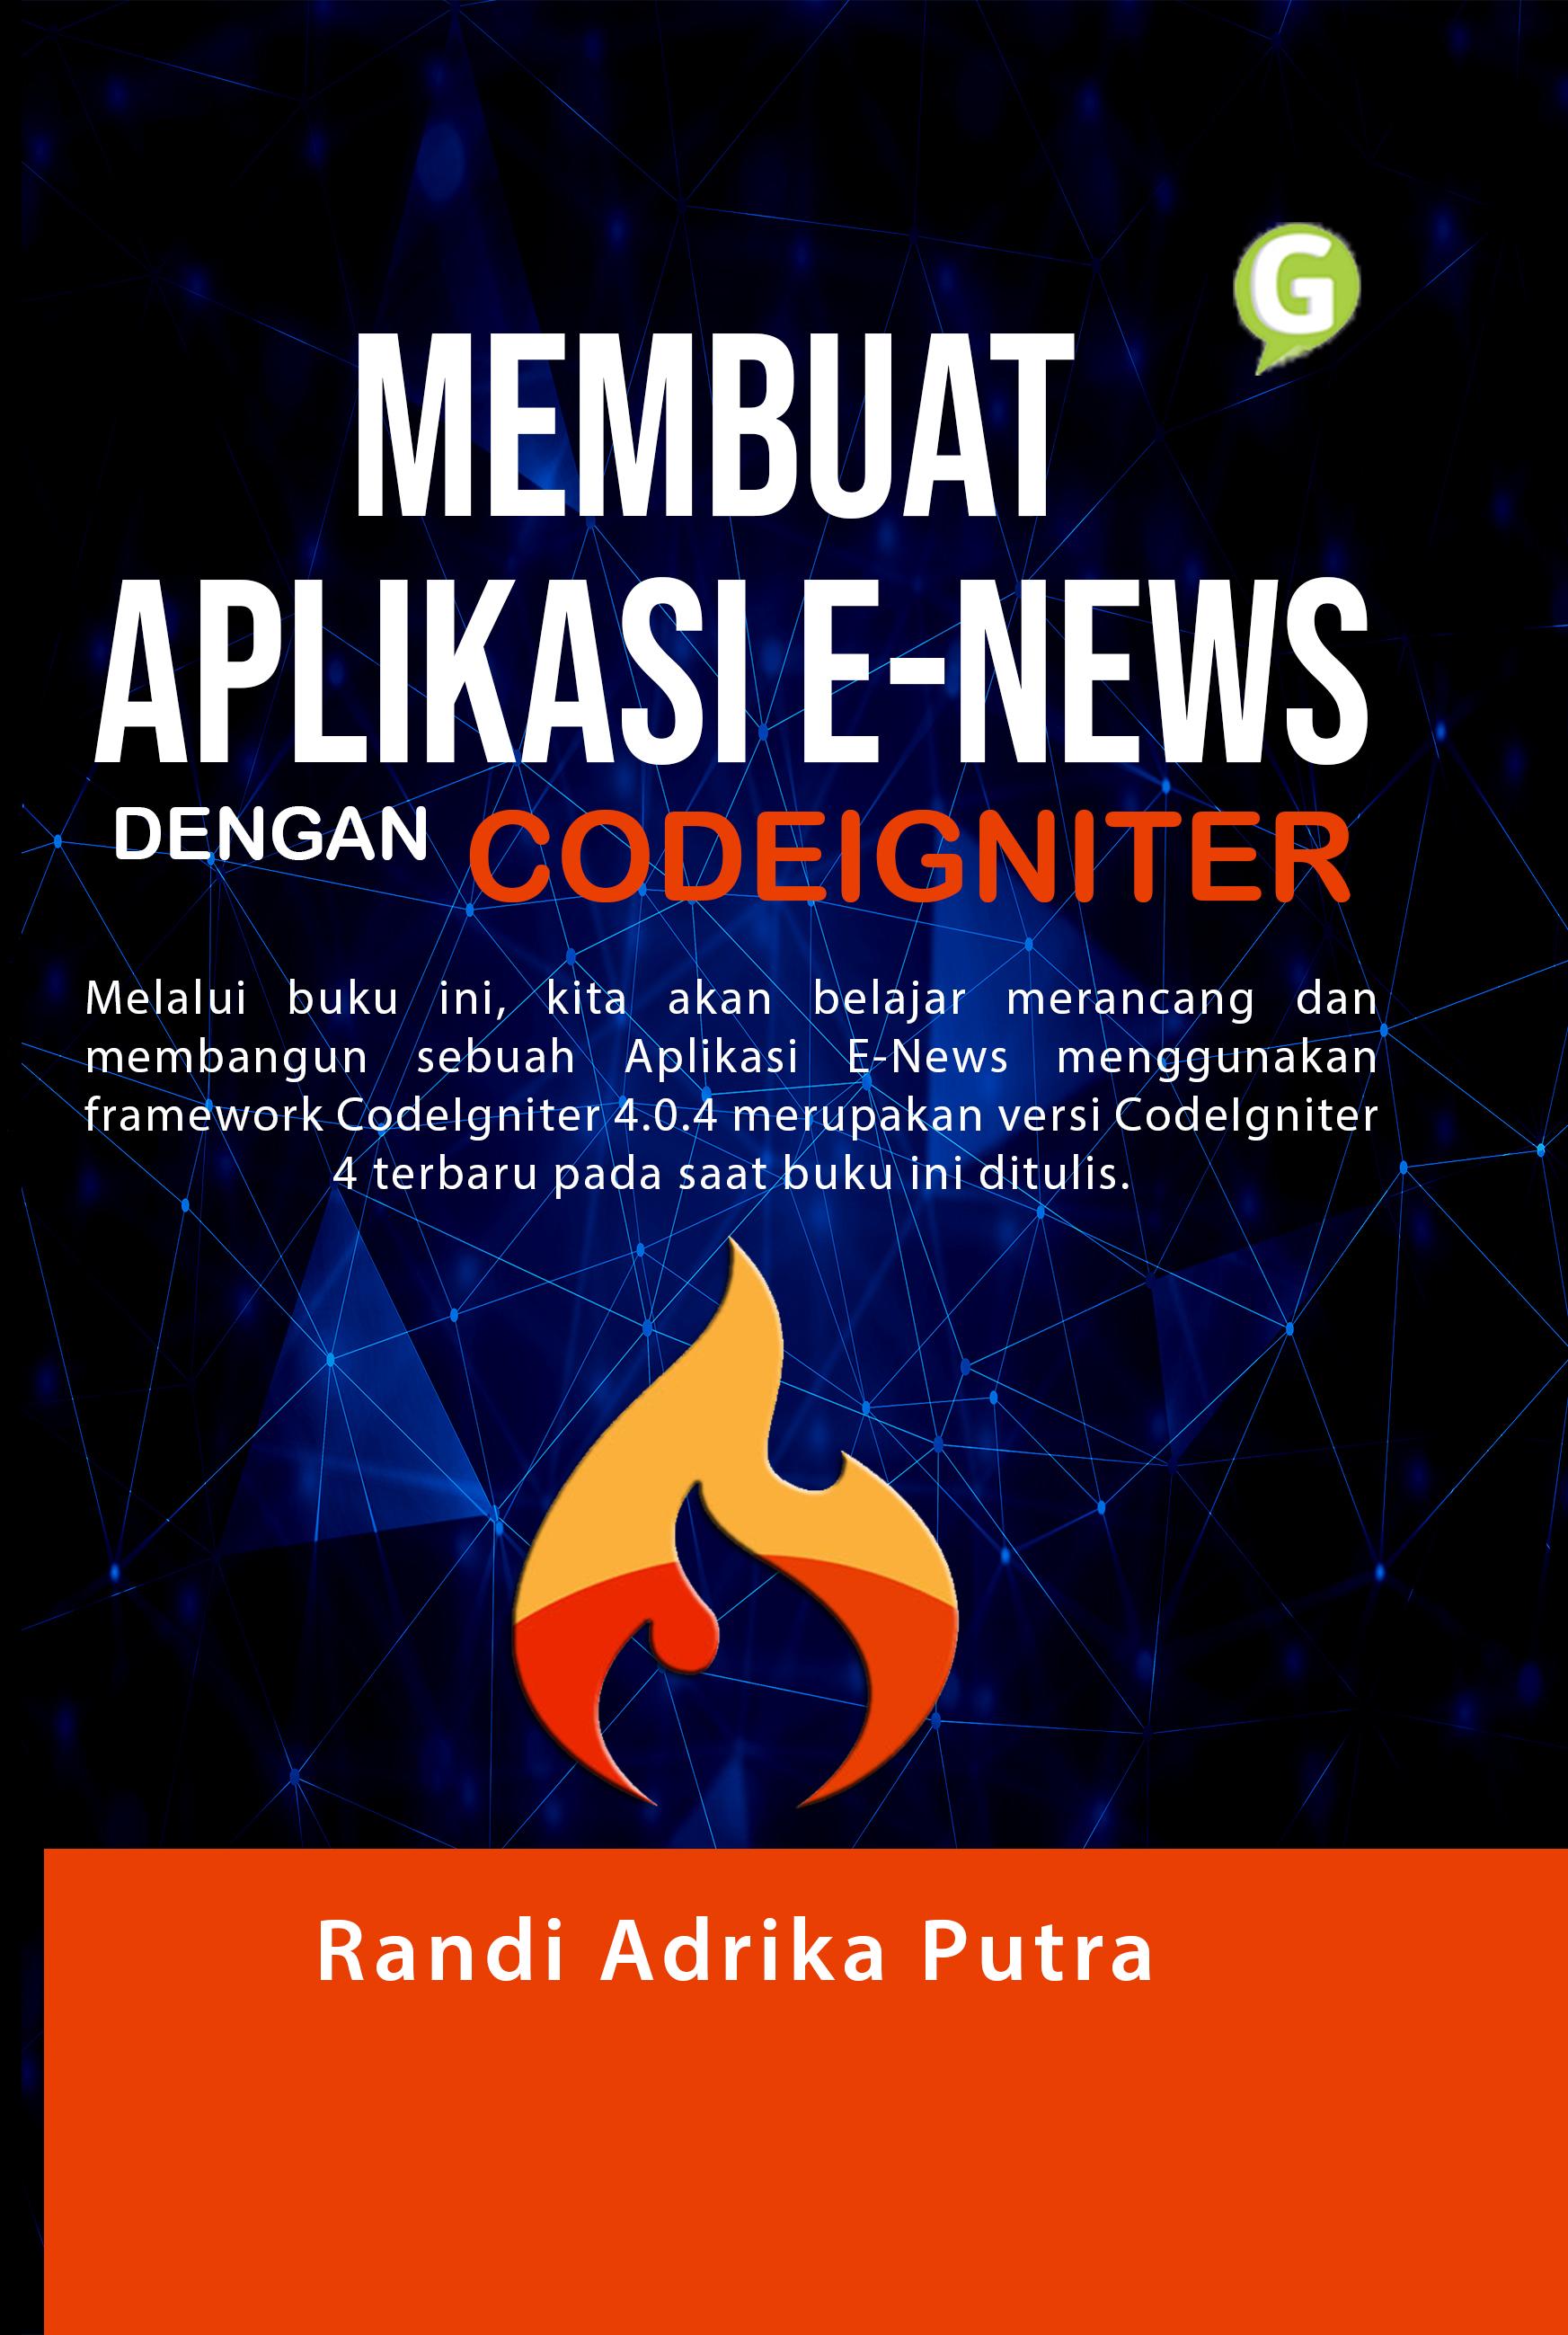 Membuat aplikasi e-news dengan CodeIgniter [sumber elektronis]